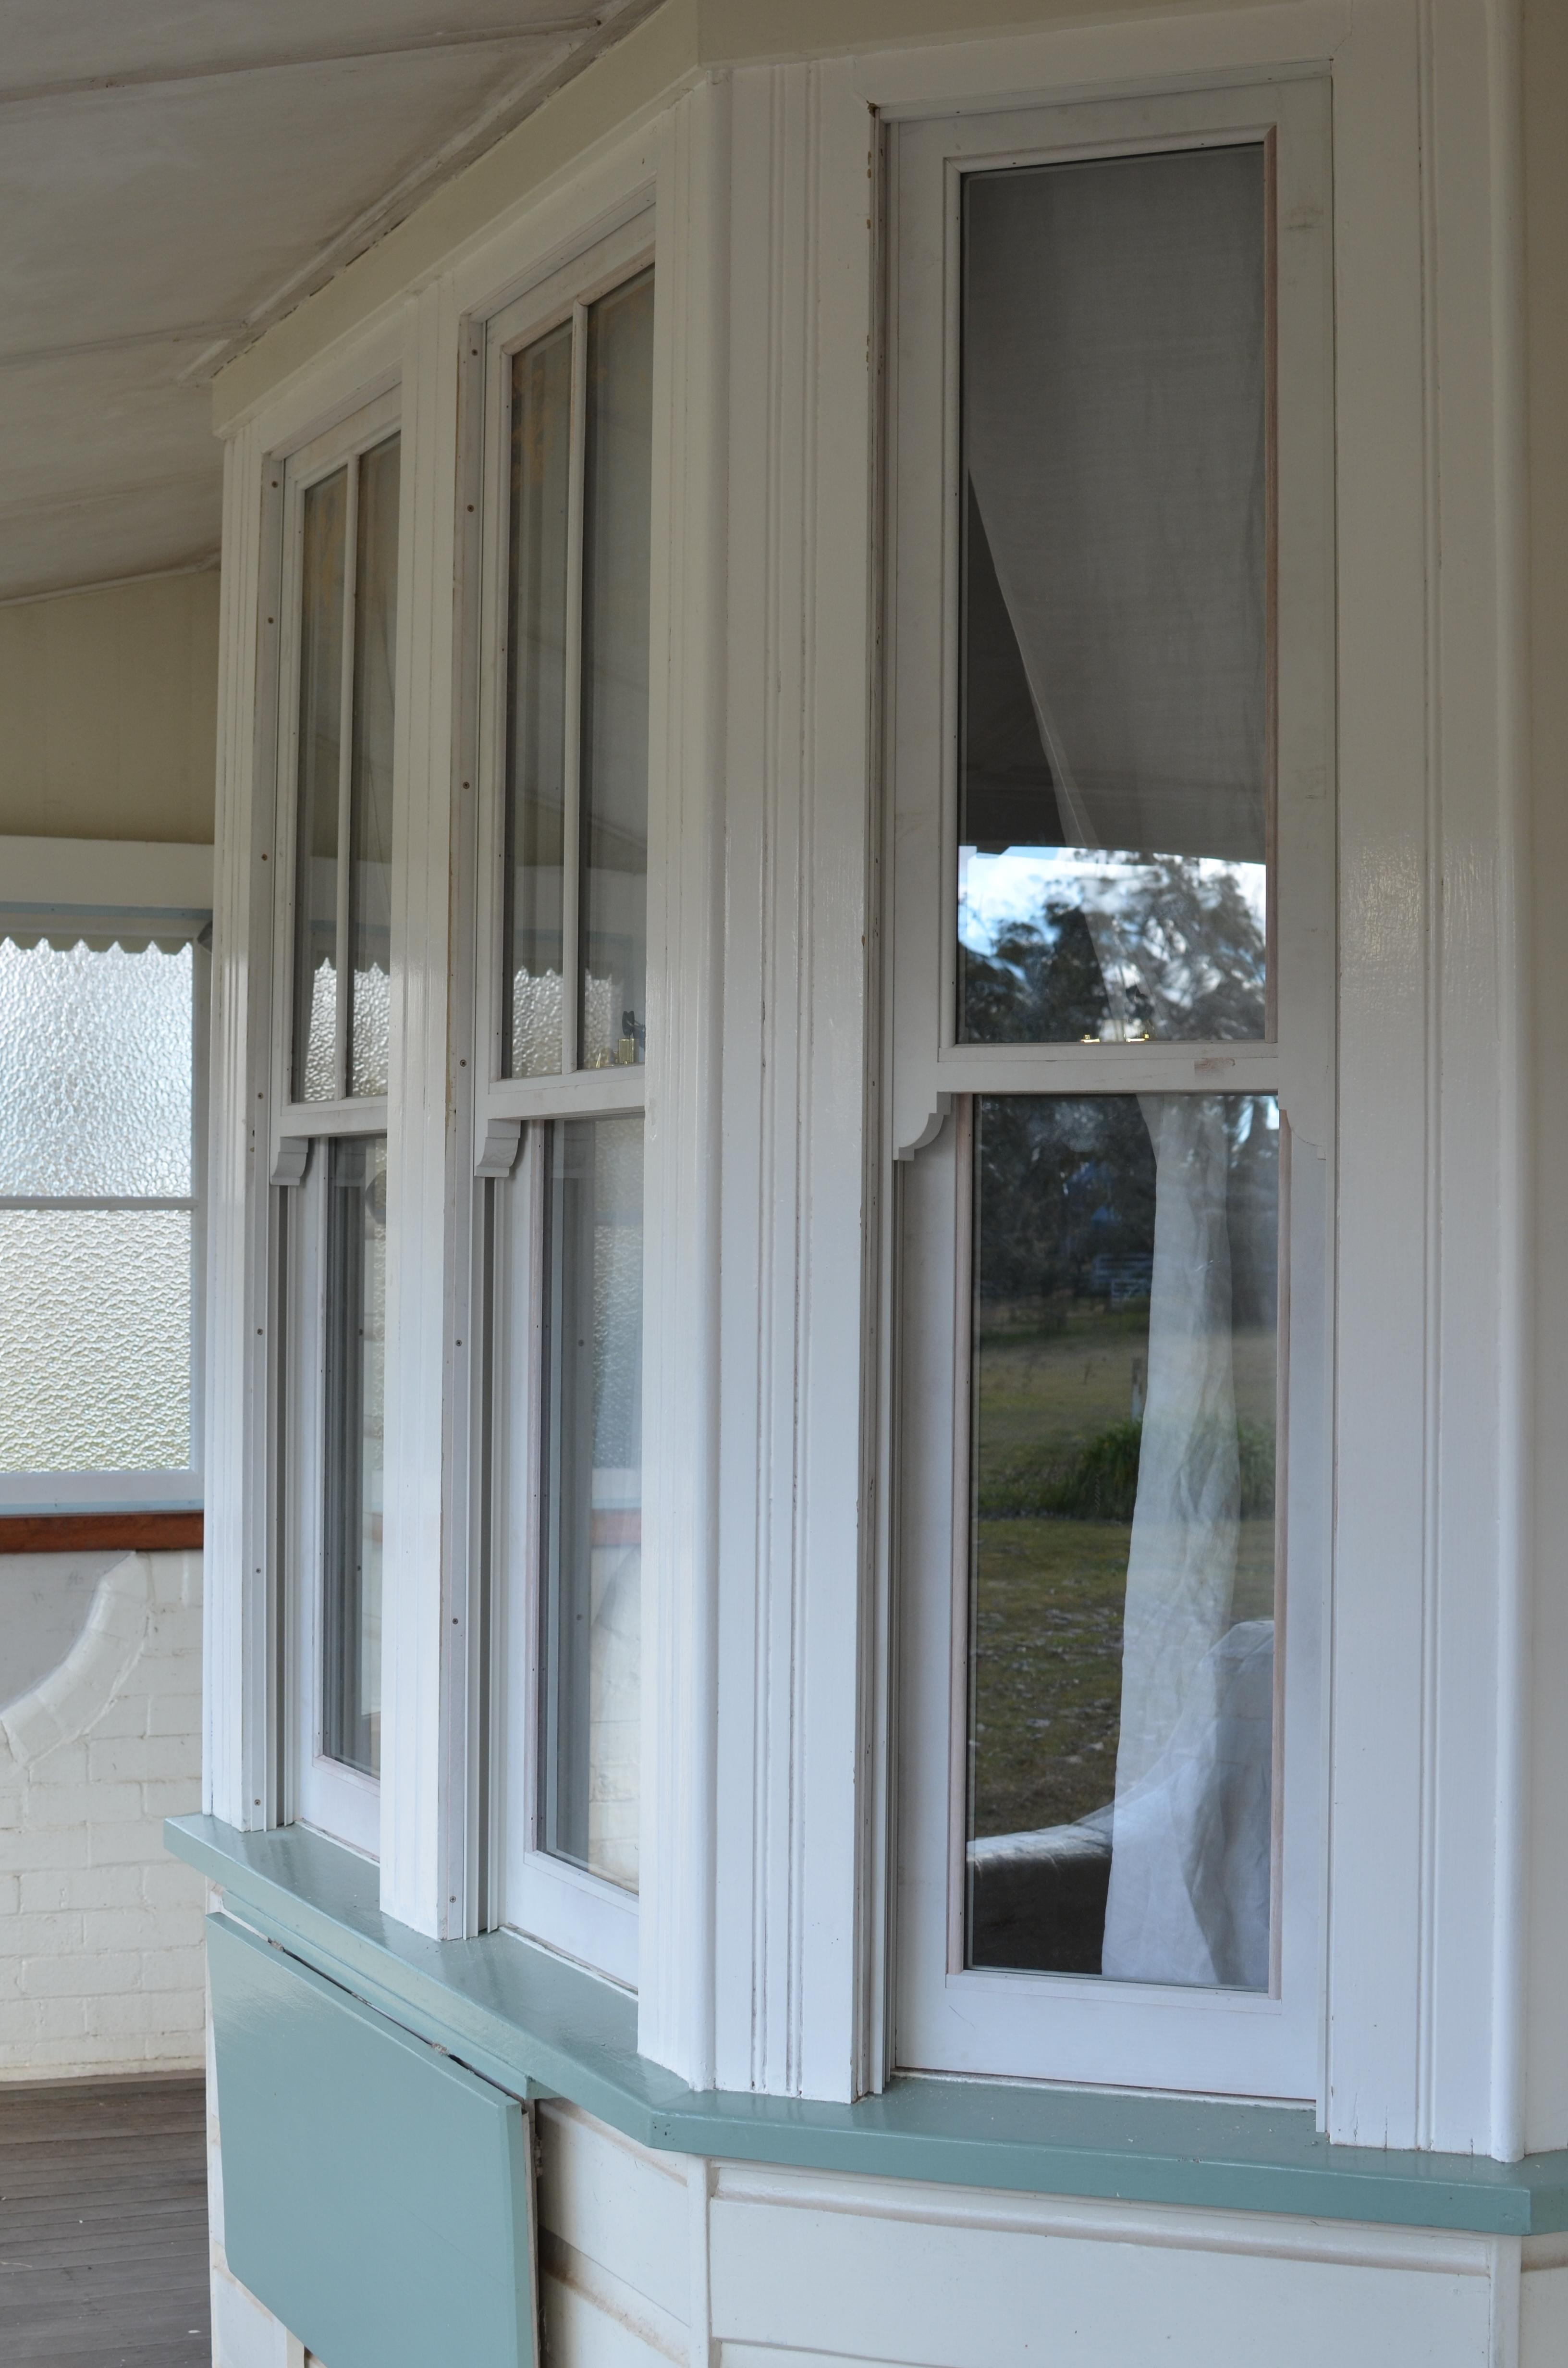 Hooper New DG Sashes and Megjambliners in Bay Window